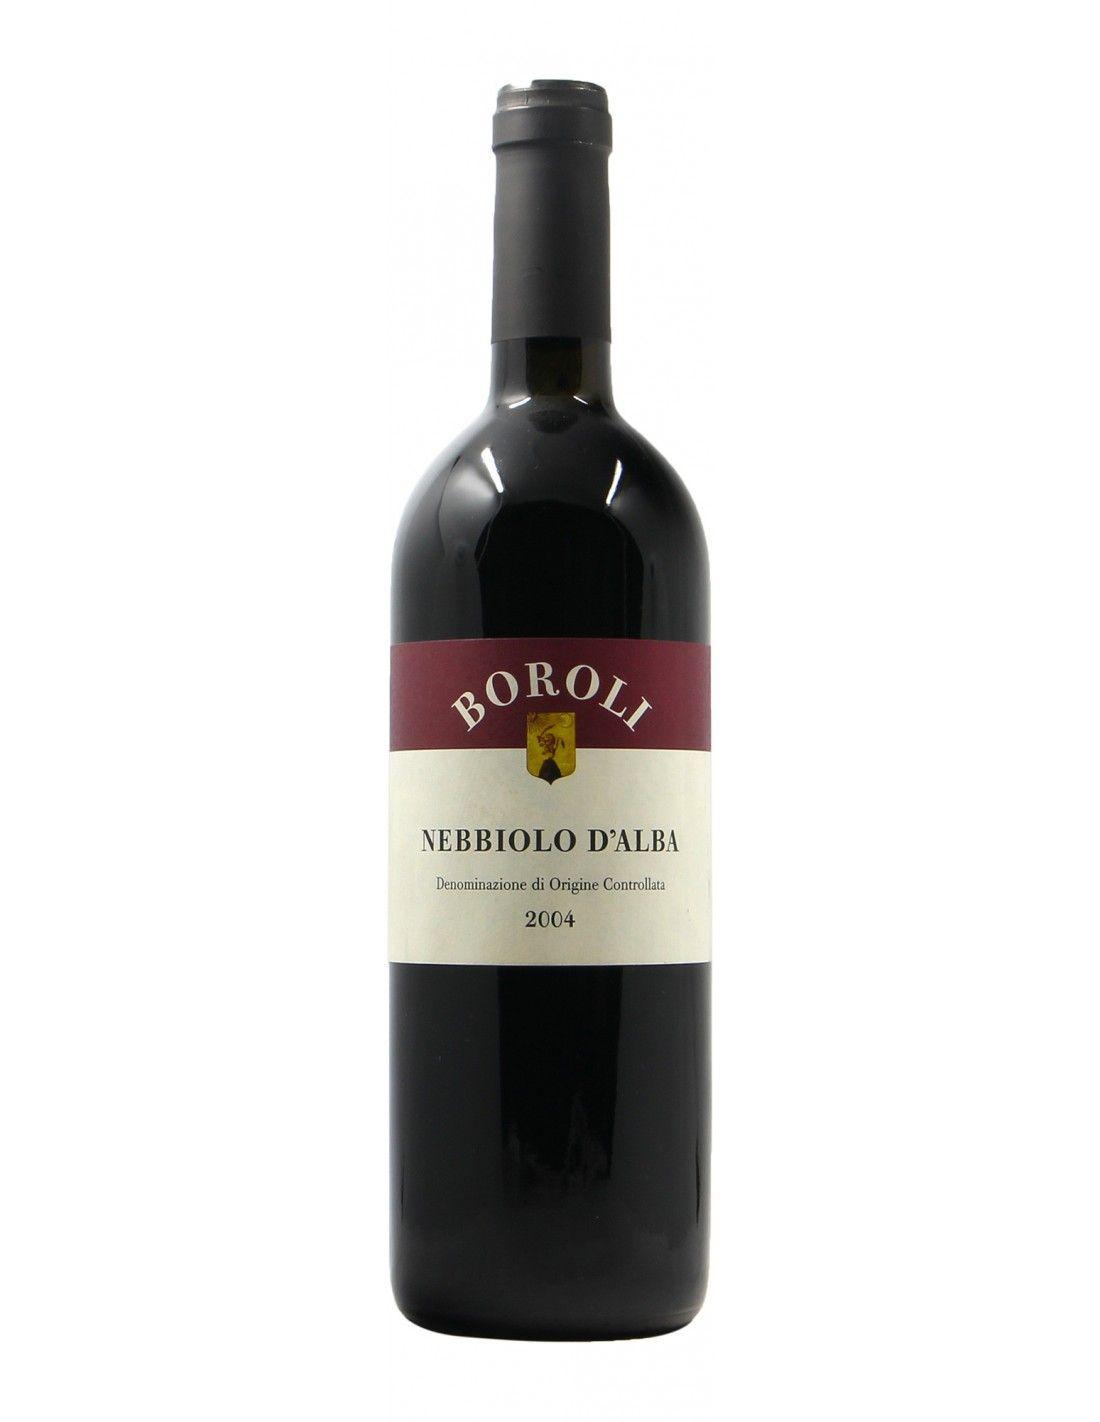 NEBBIOLO D'ALBA 2004 BOROLI Grandi Bottiglie